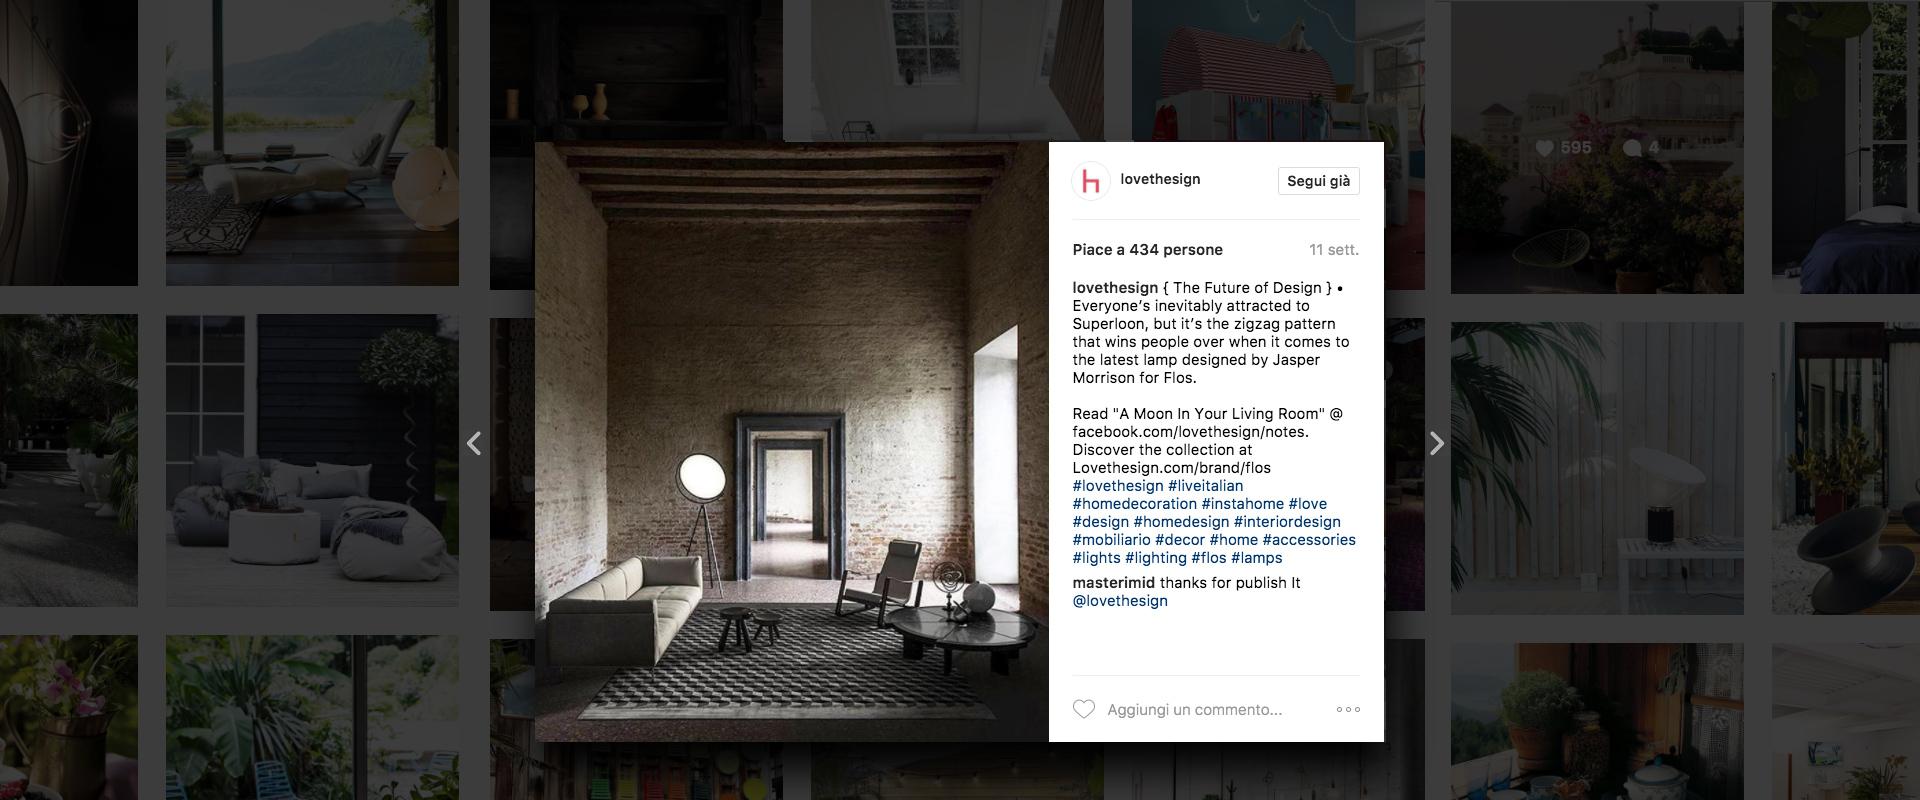 Design In The Instagram Age Lovethesign